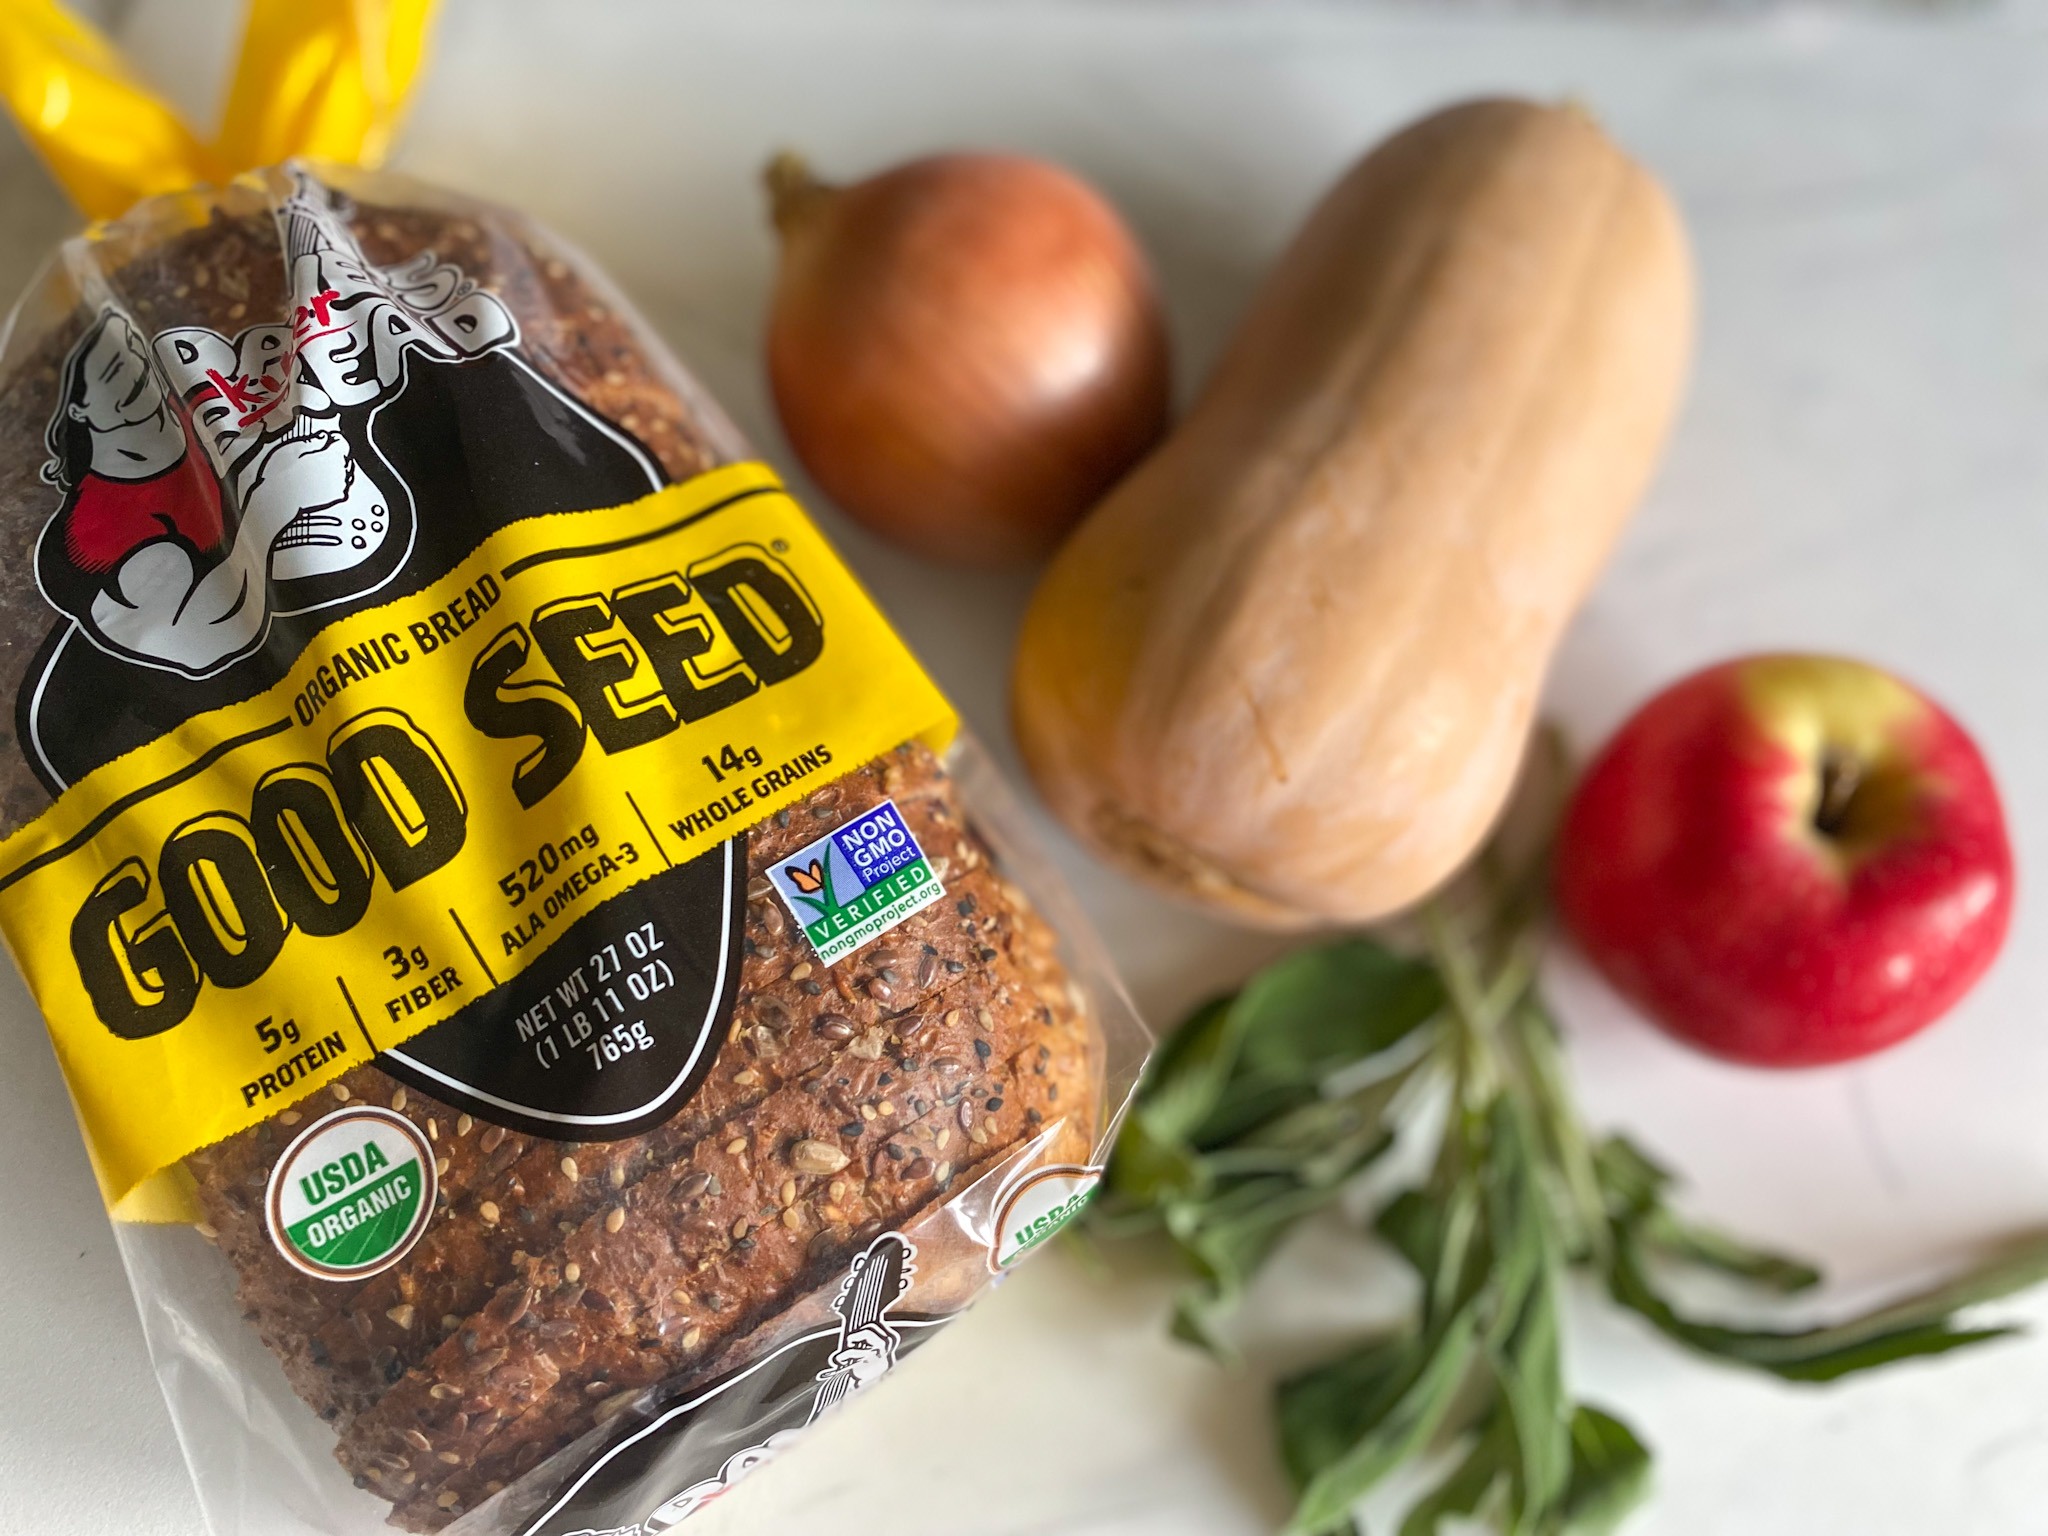 Dave's Killer Good Seed Bread